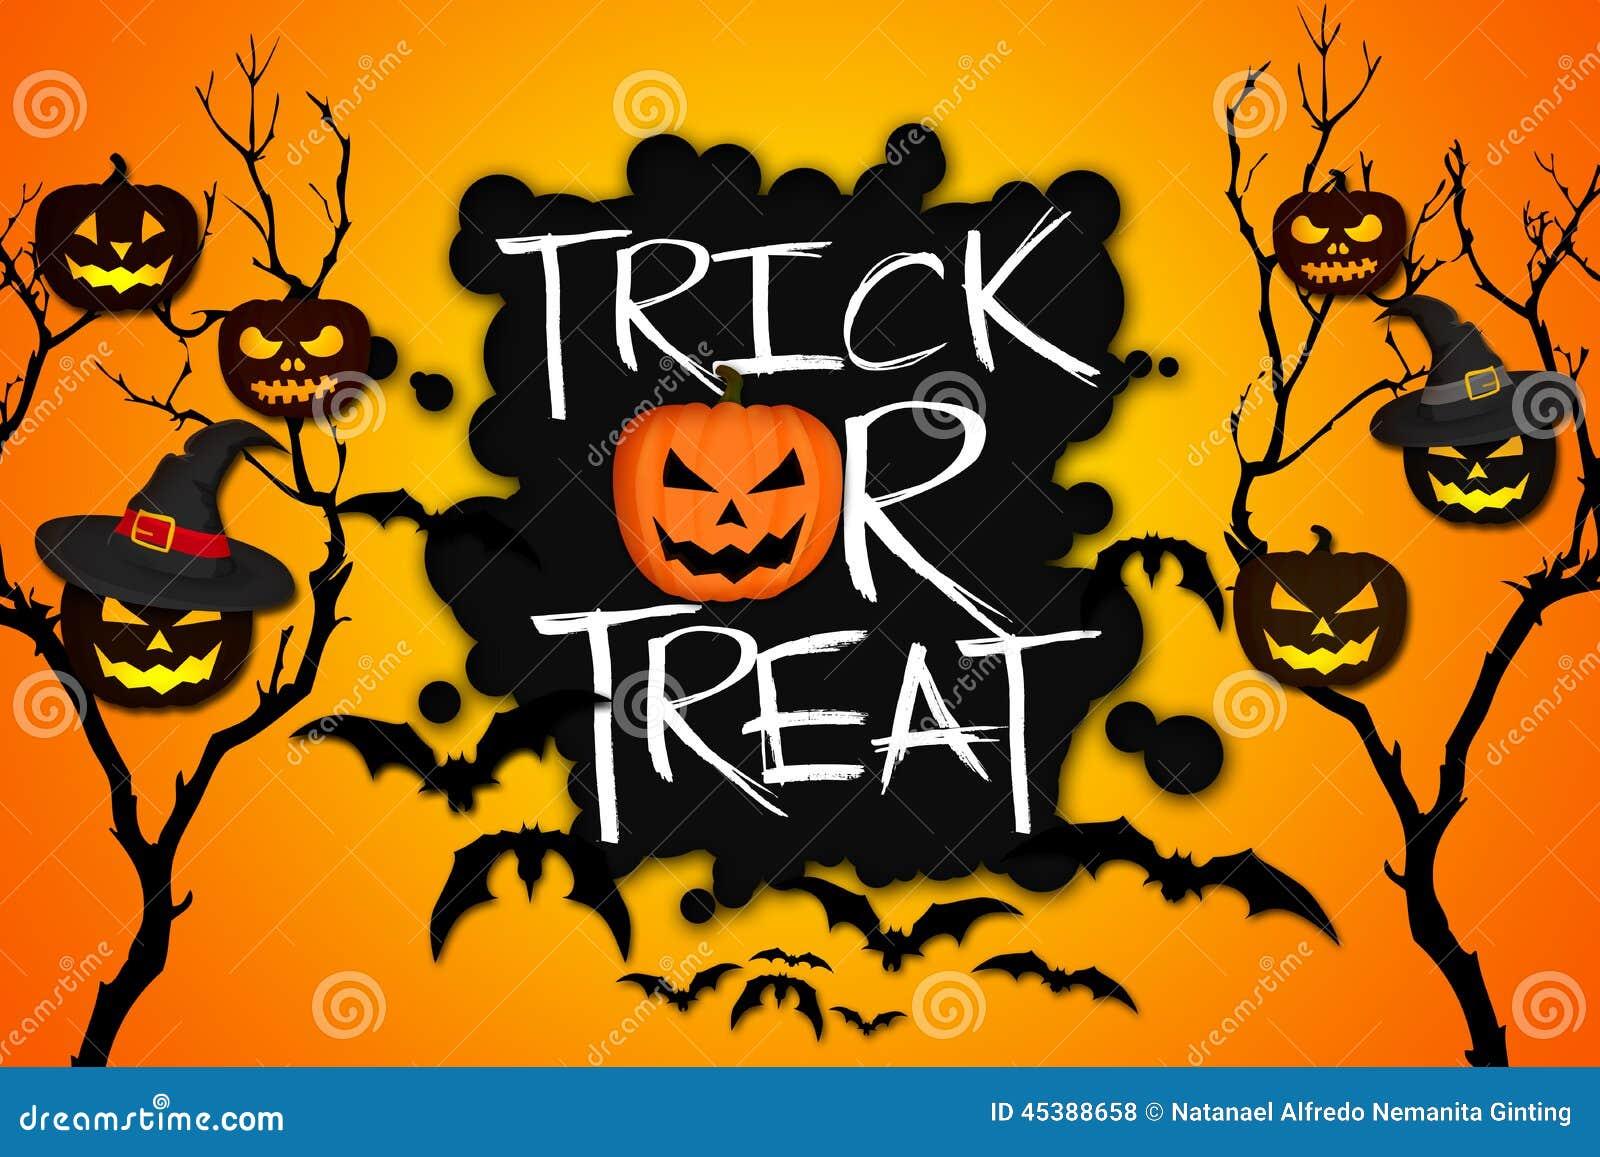 trick or treat tree halloween pumpkins bats orange background stock rh dreamstime com